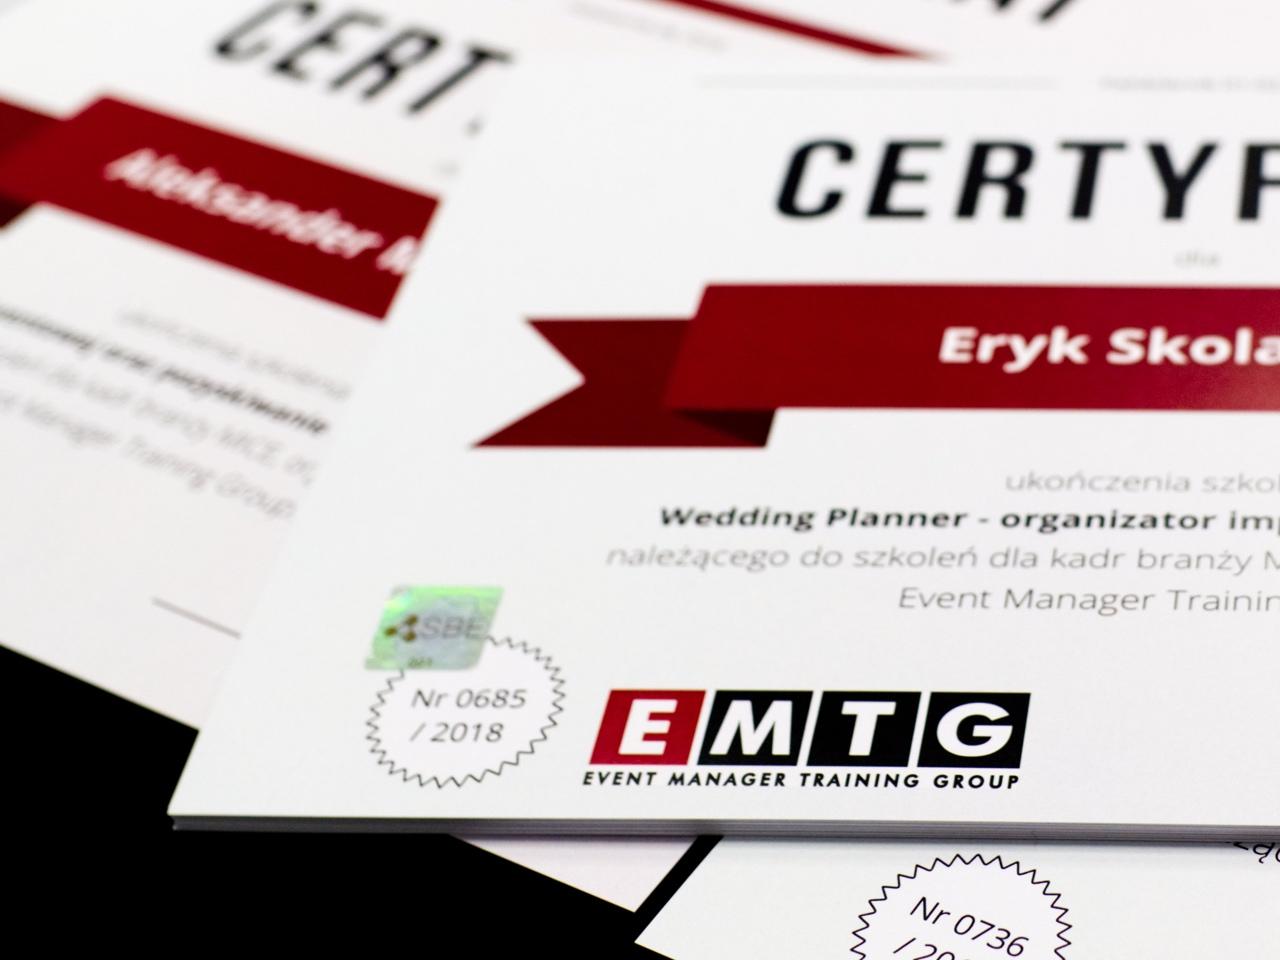 Certyfikat szkolenia Event Manager Training Group